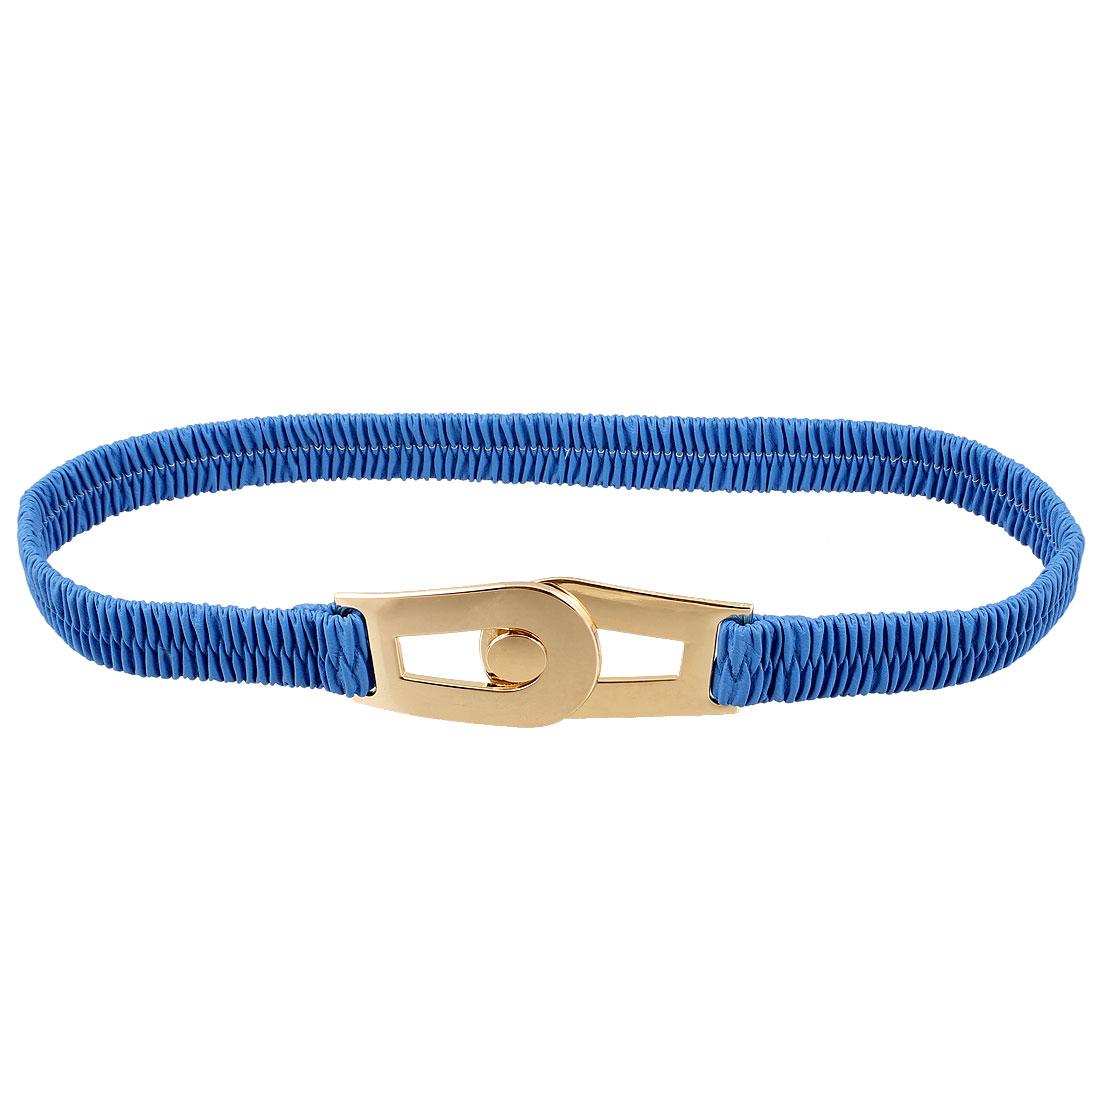 Blue Faux Leather Interlocking Buckle Elastic Waist Cinch Belt for Woman